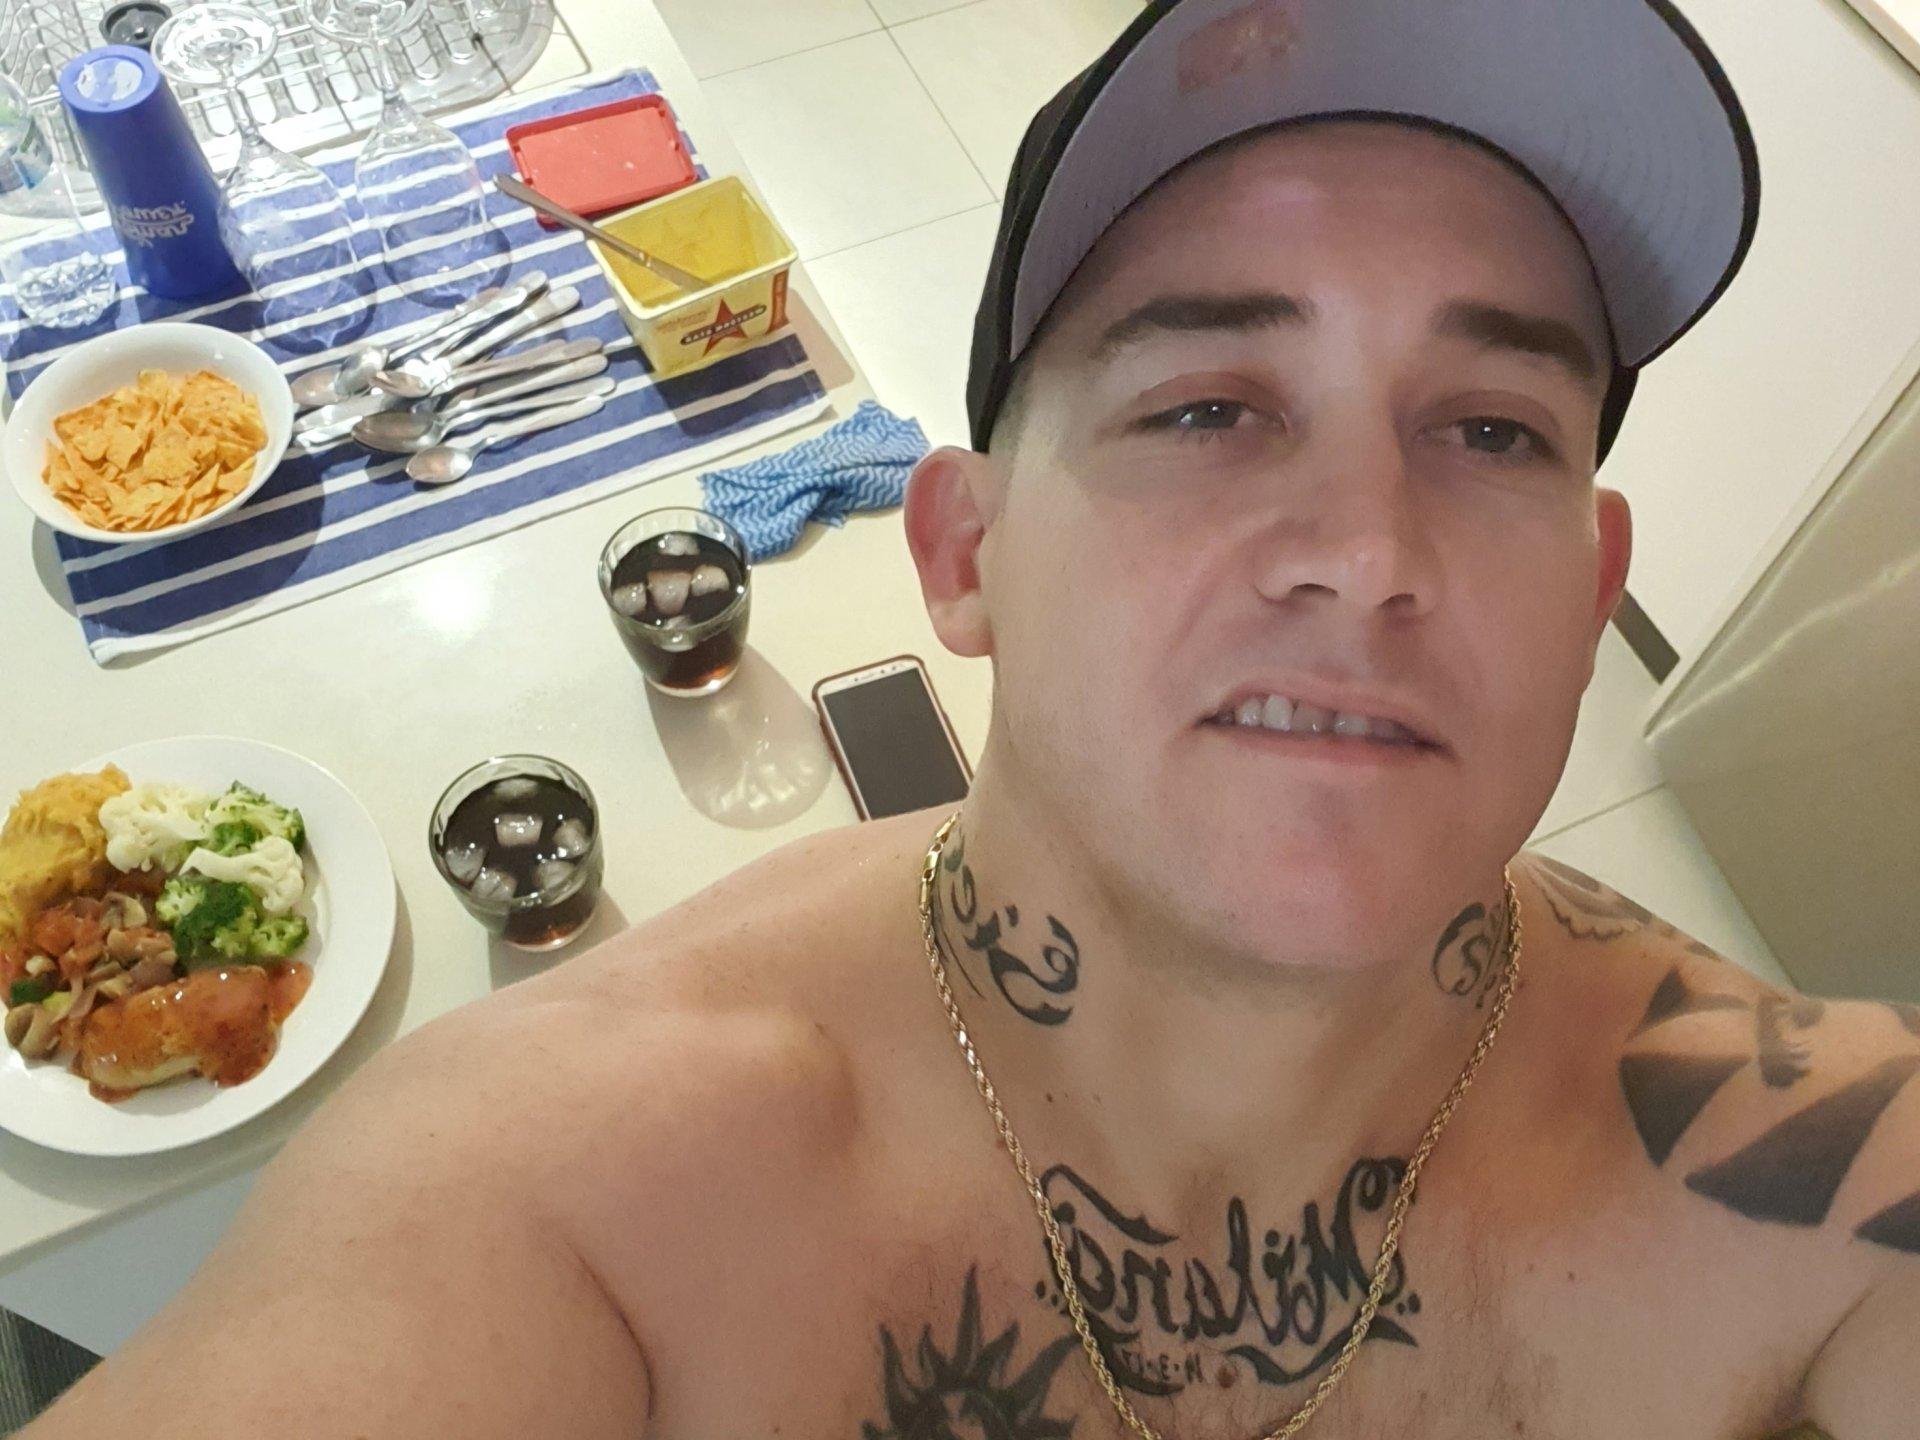 Max  from Queensland,Australia